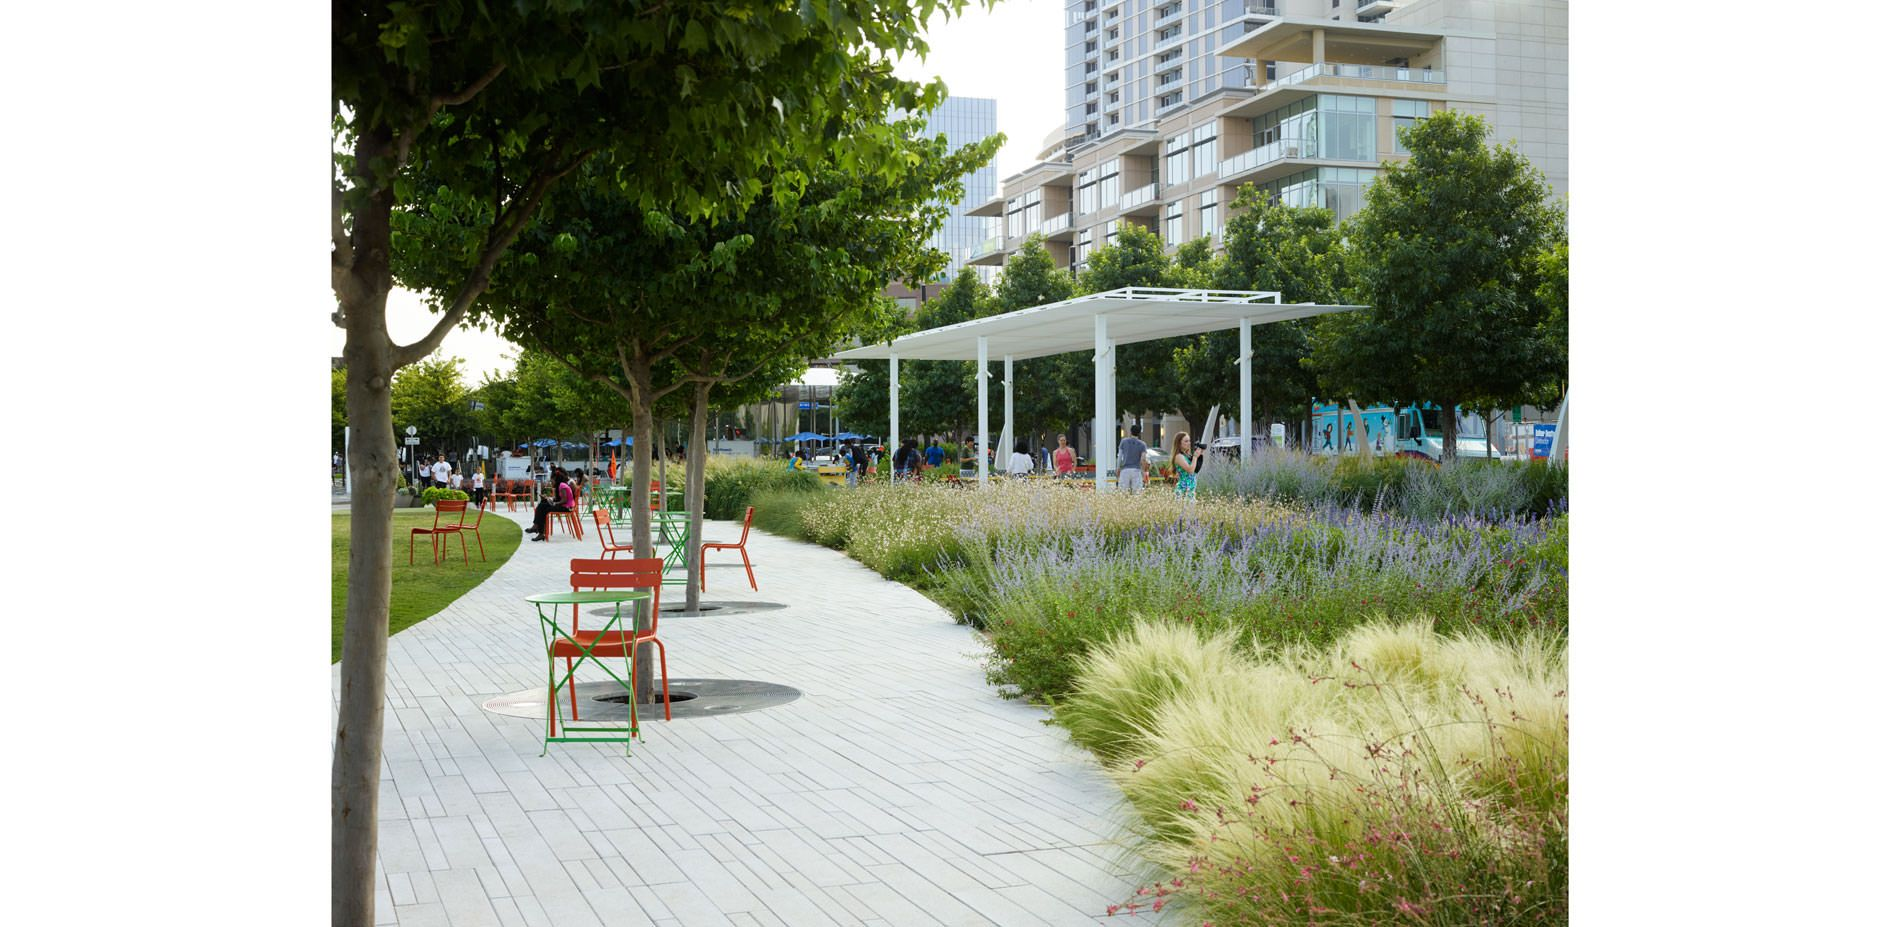 Klyde Warren Park Bridging The Gap In Downtown Dallas 2017 Asla Professional Awards Downtown Dallas Landscape Design Park